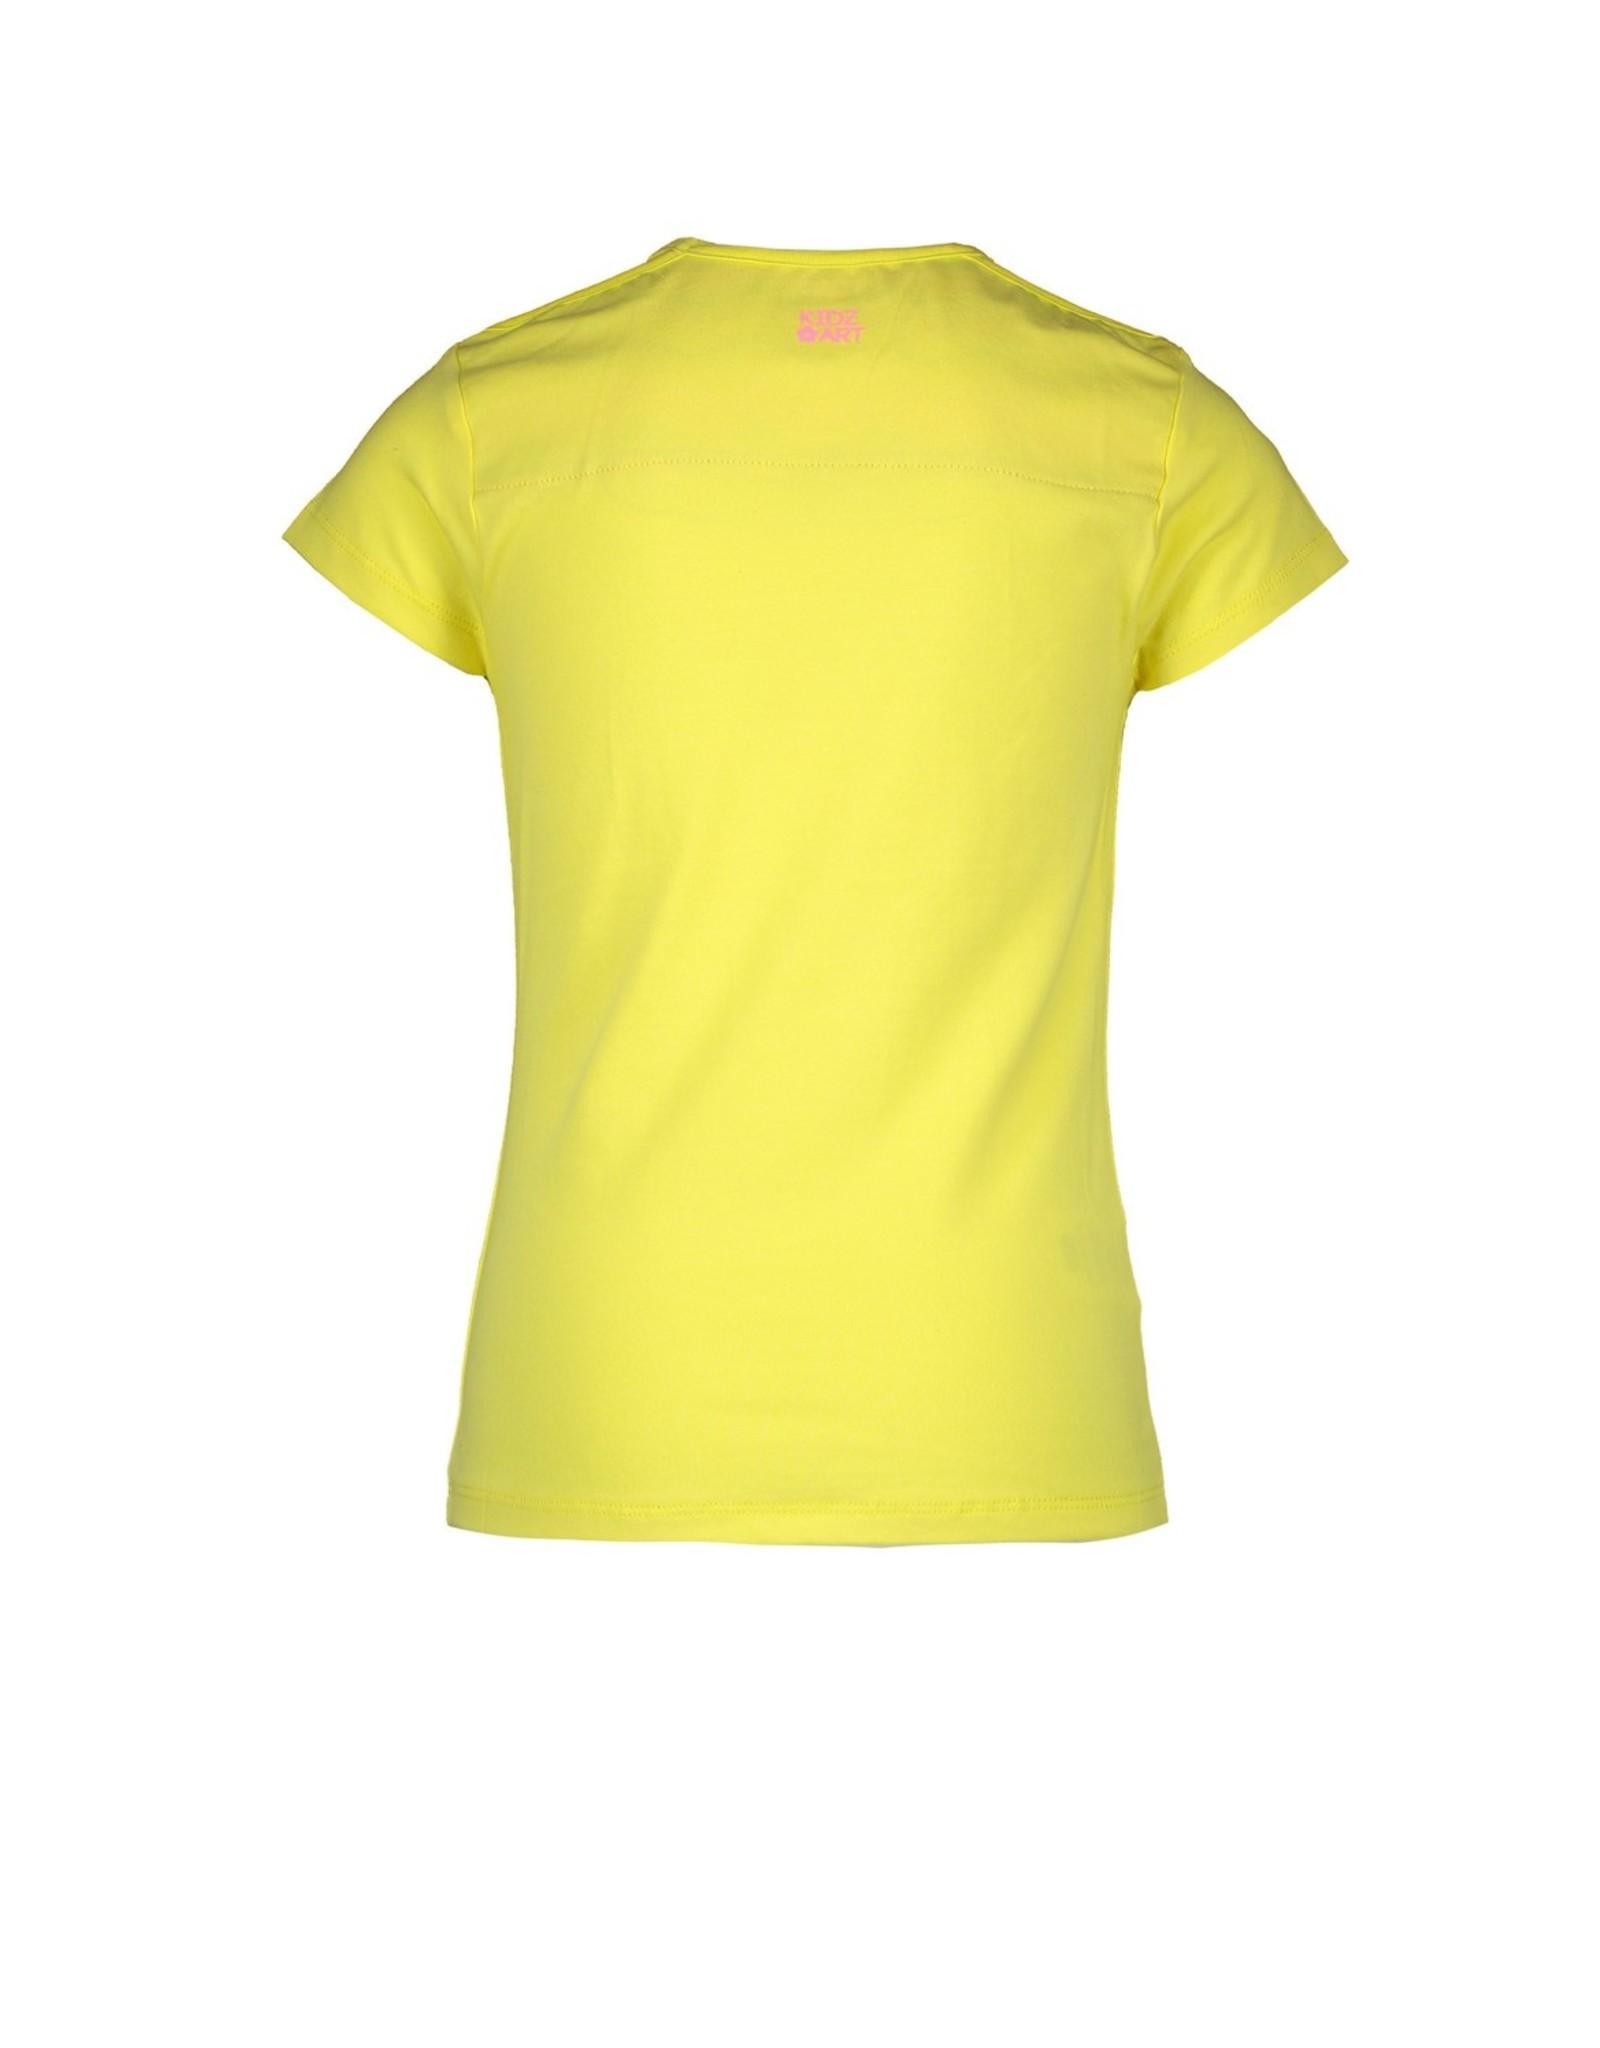 Kidz-Art T-shirt s/s plain panel print CONFETTI maat 122/128